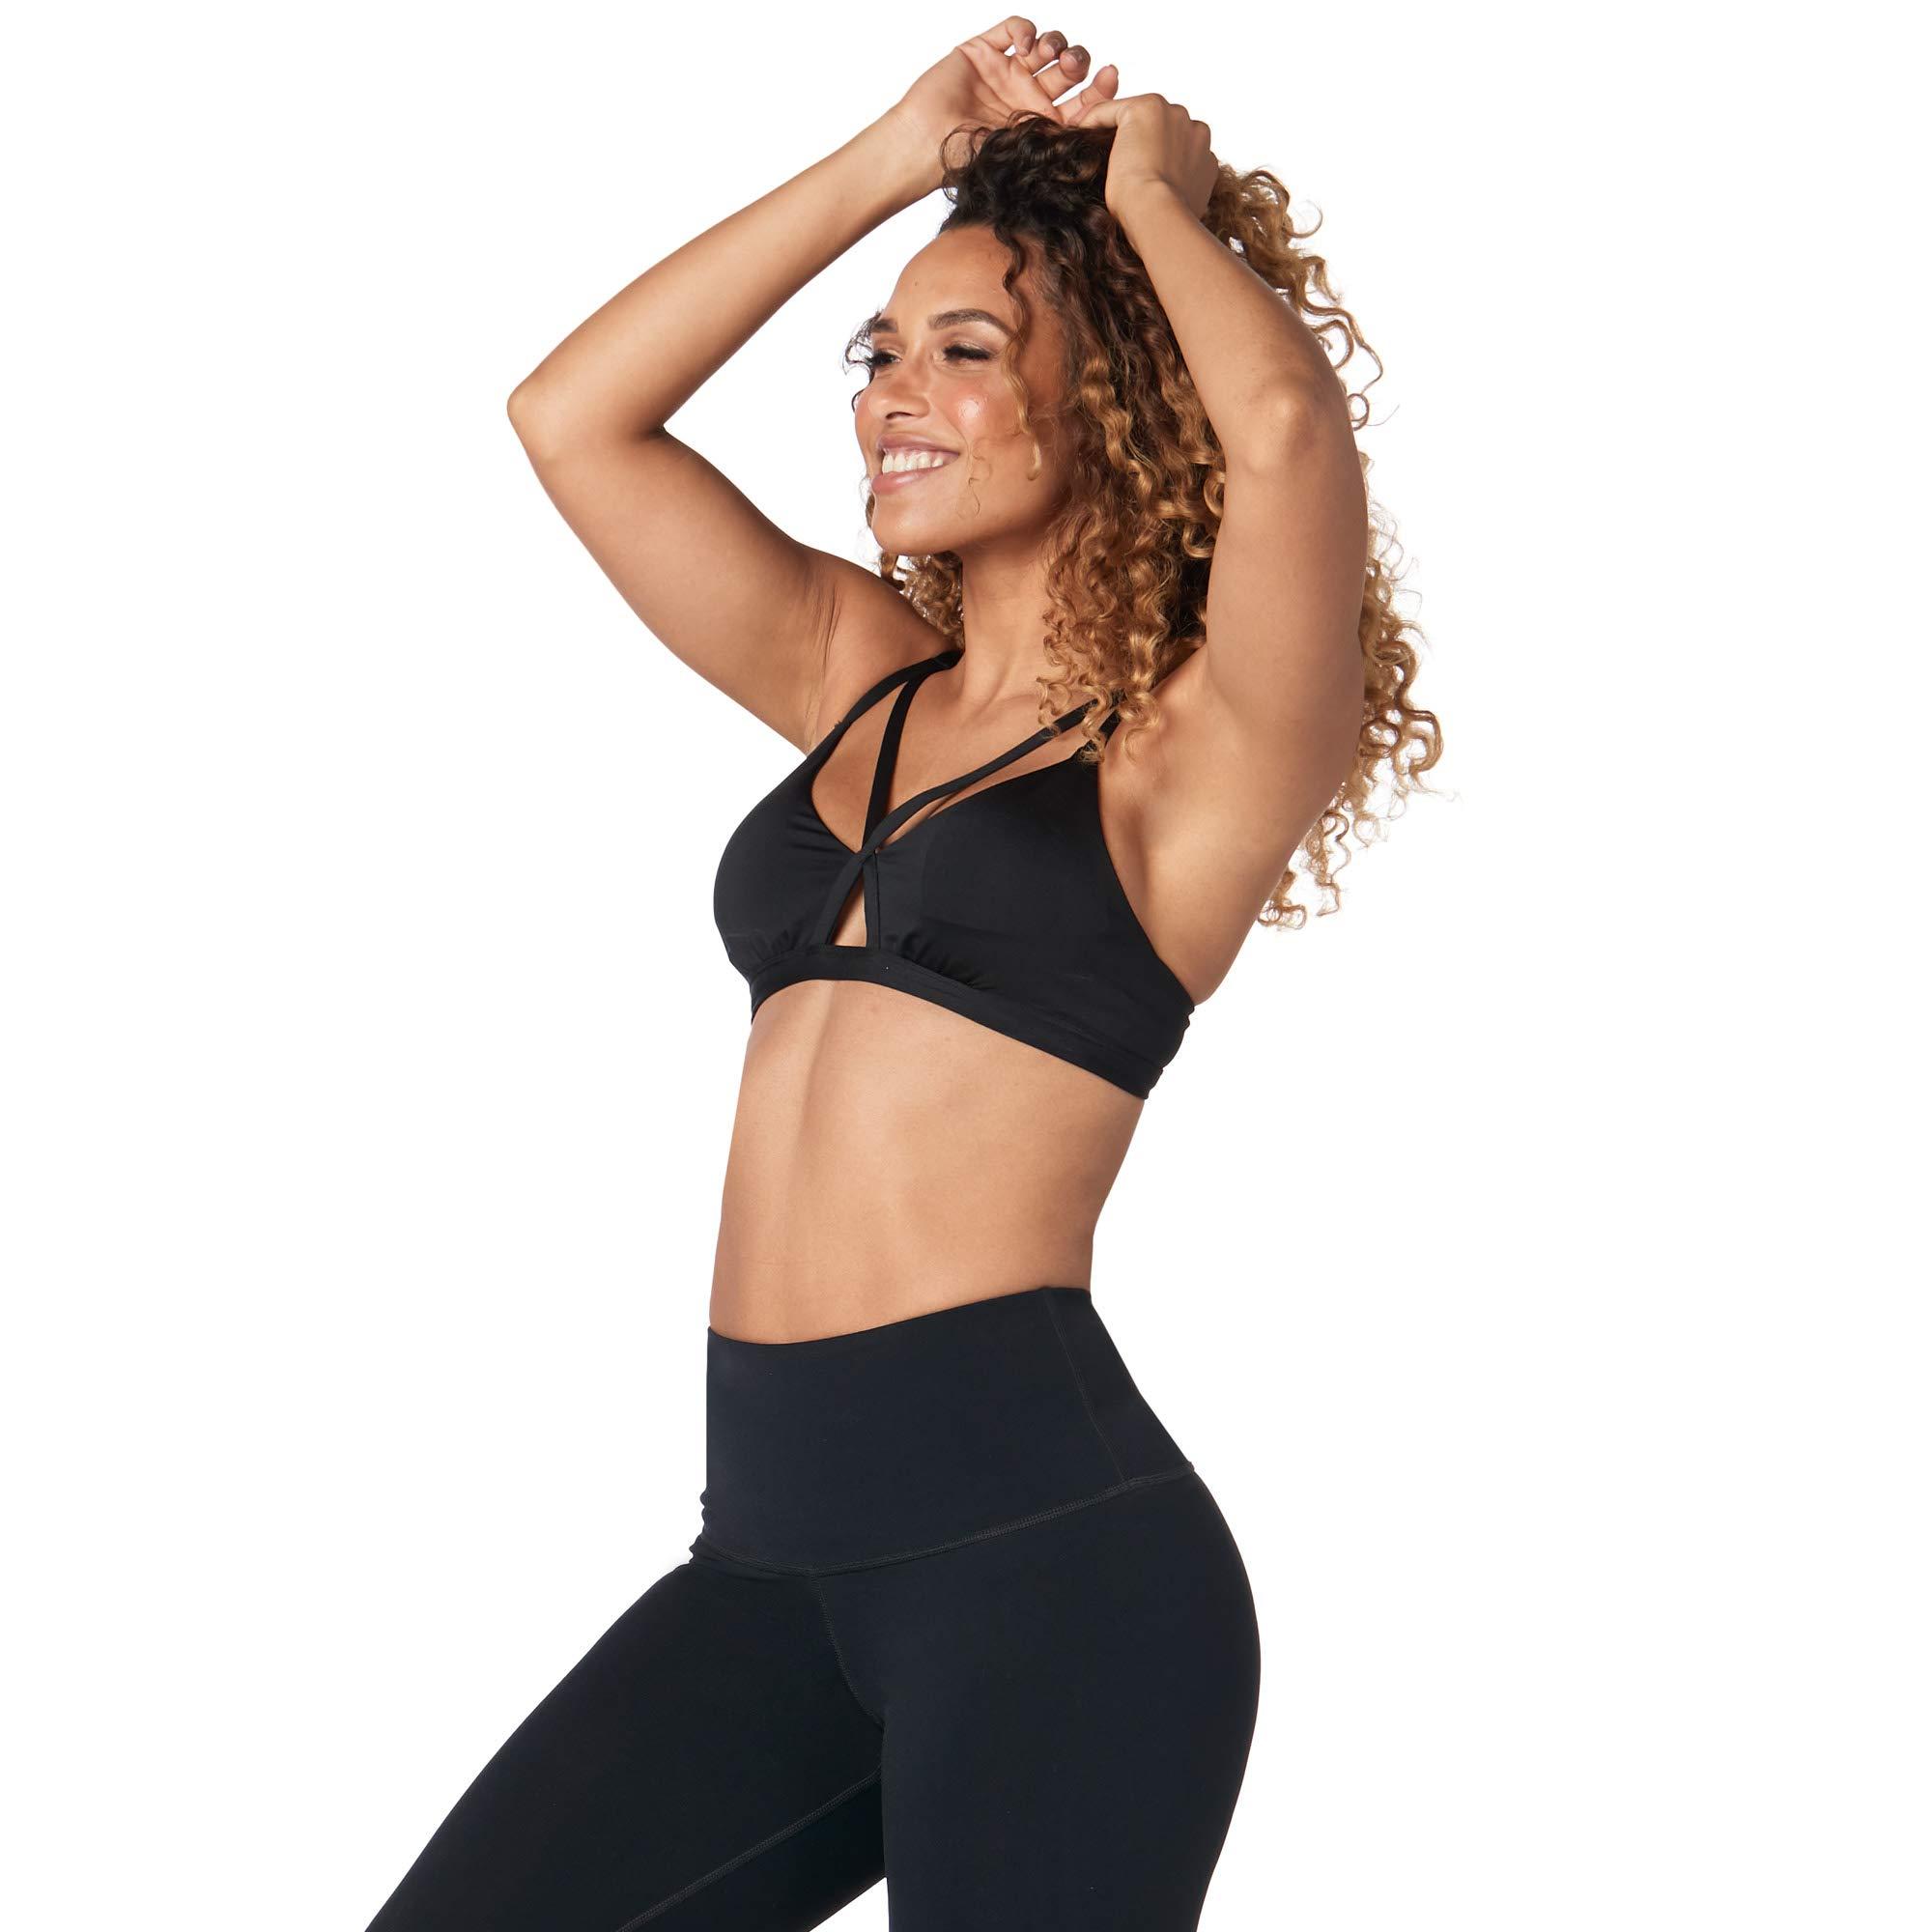 Zumba Women's Activewear Fashion Print Bralette with Straps, Bold Black, X-Small